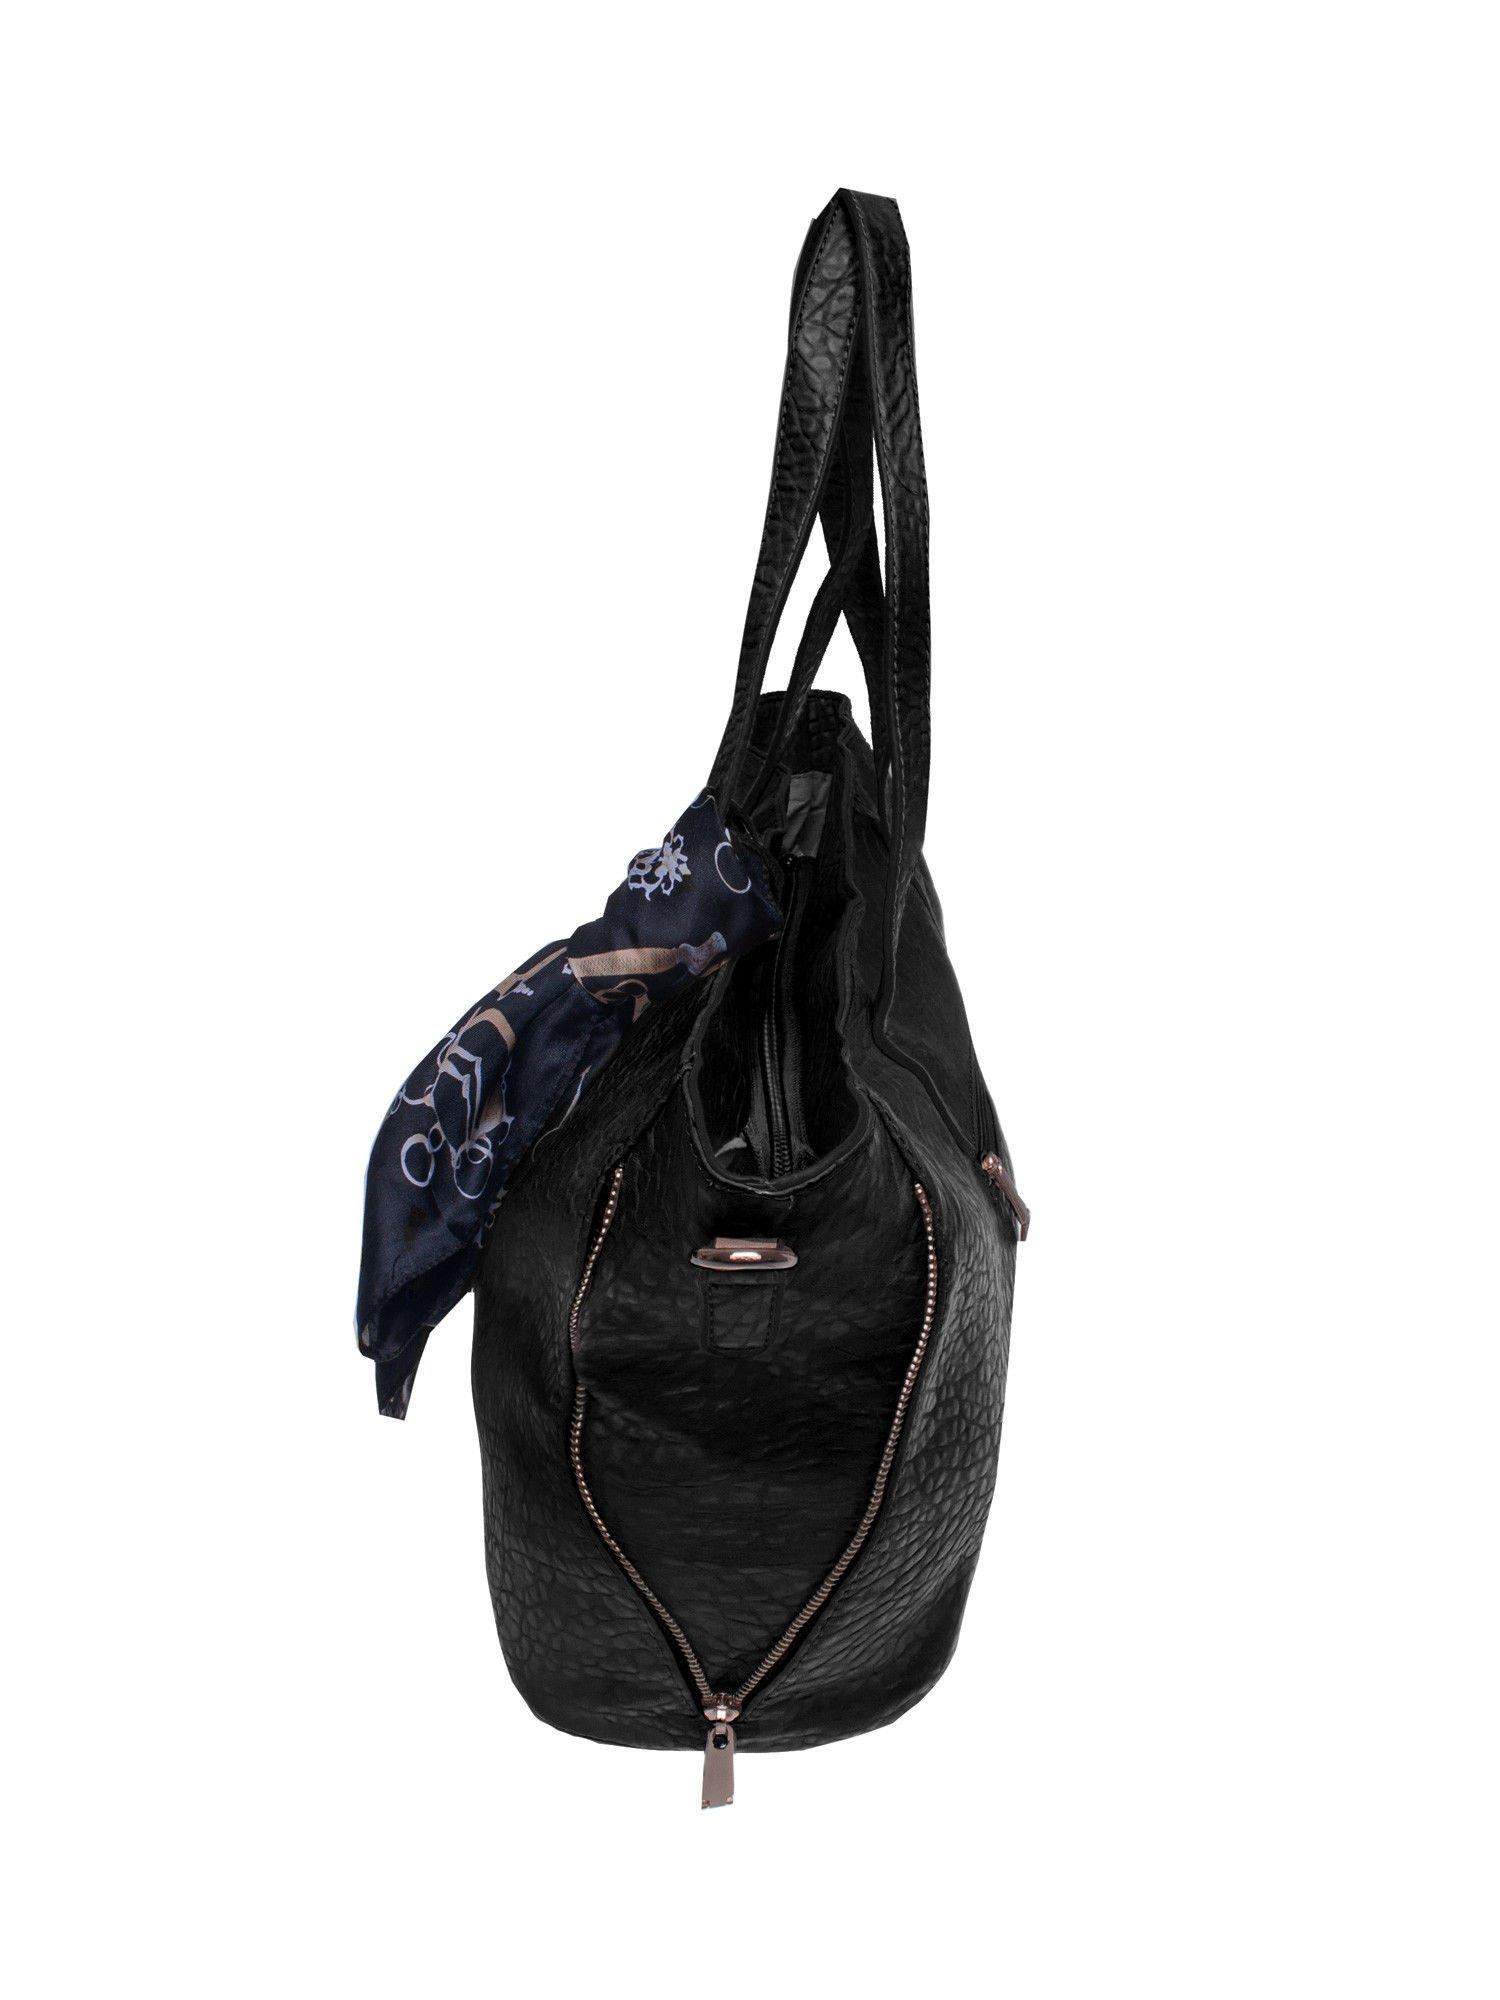 Czarna torebka shopper bag z apaszką                                  zdj.                                  3